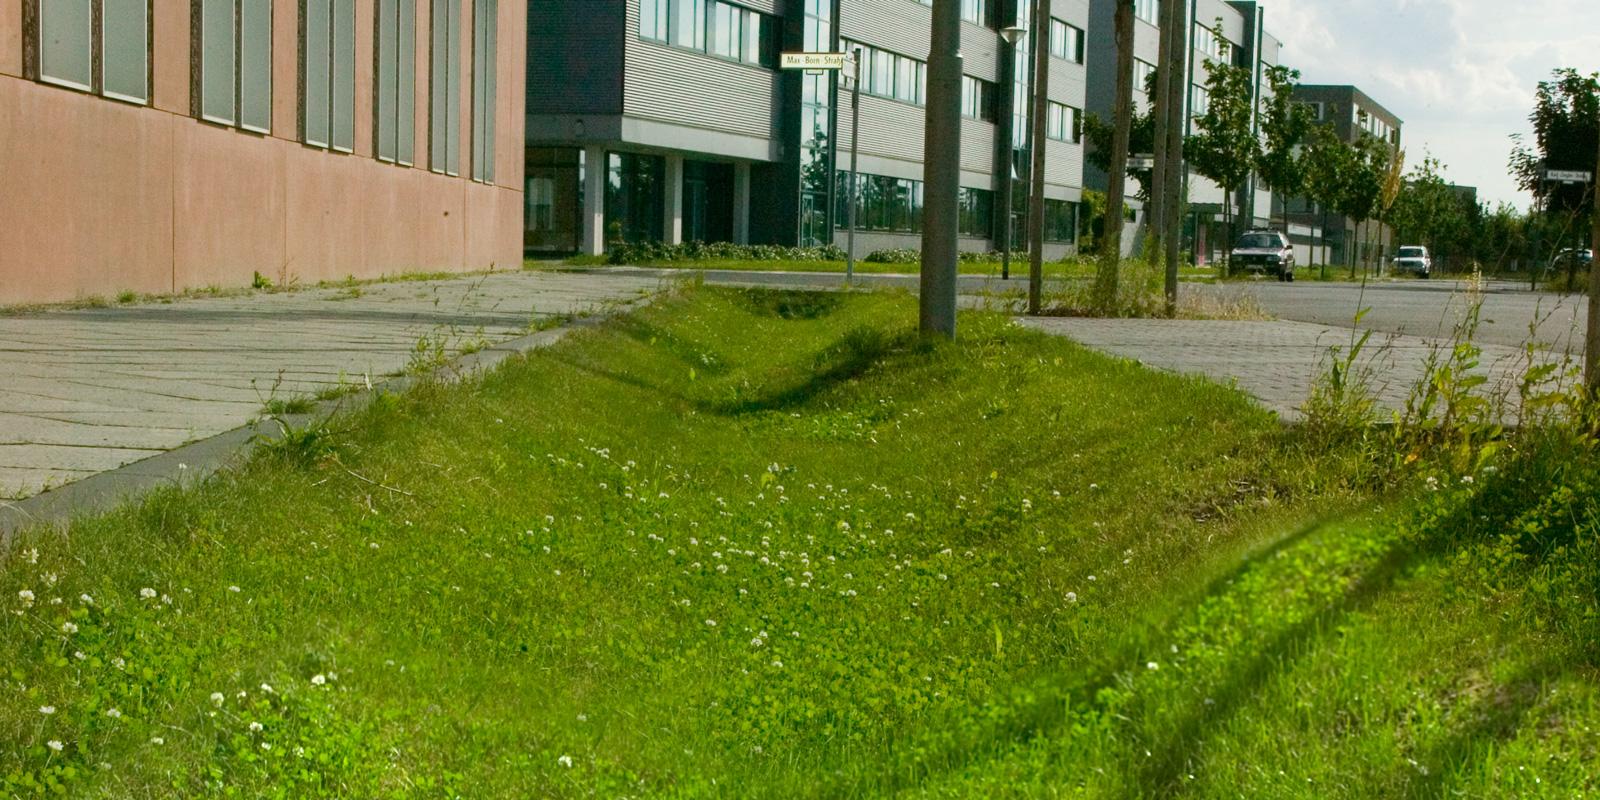 Regenwasserversickerung in Mulden und Rigolen in Berlin Adlershof